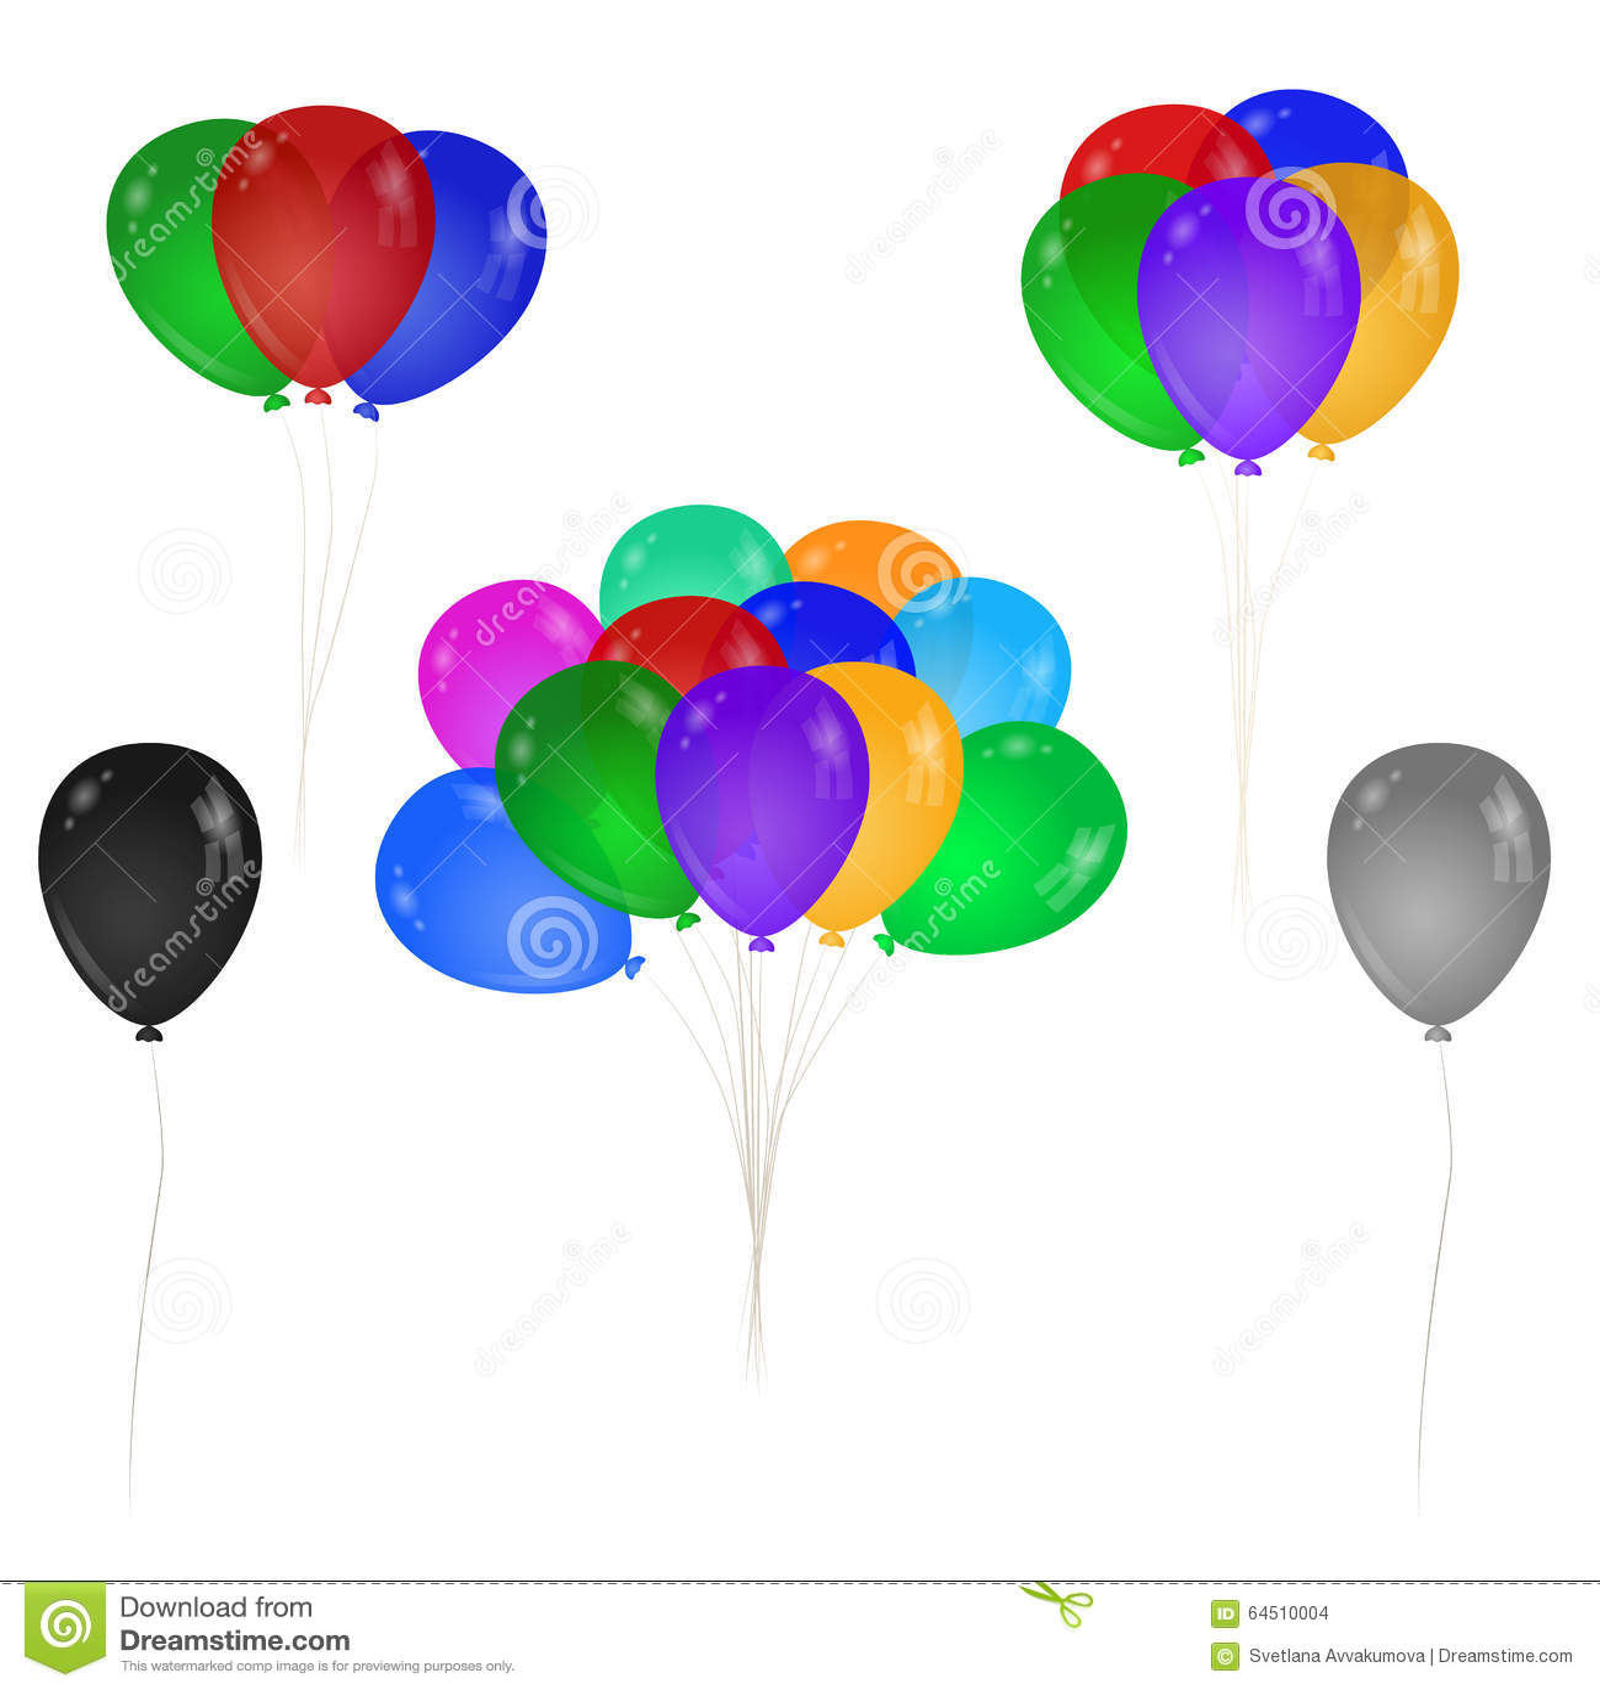 A bunch of colorful balloons. Single balloon.